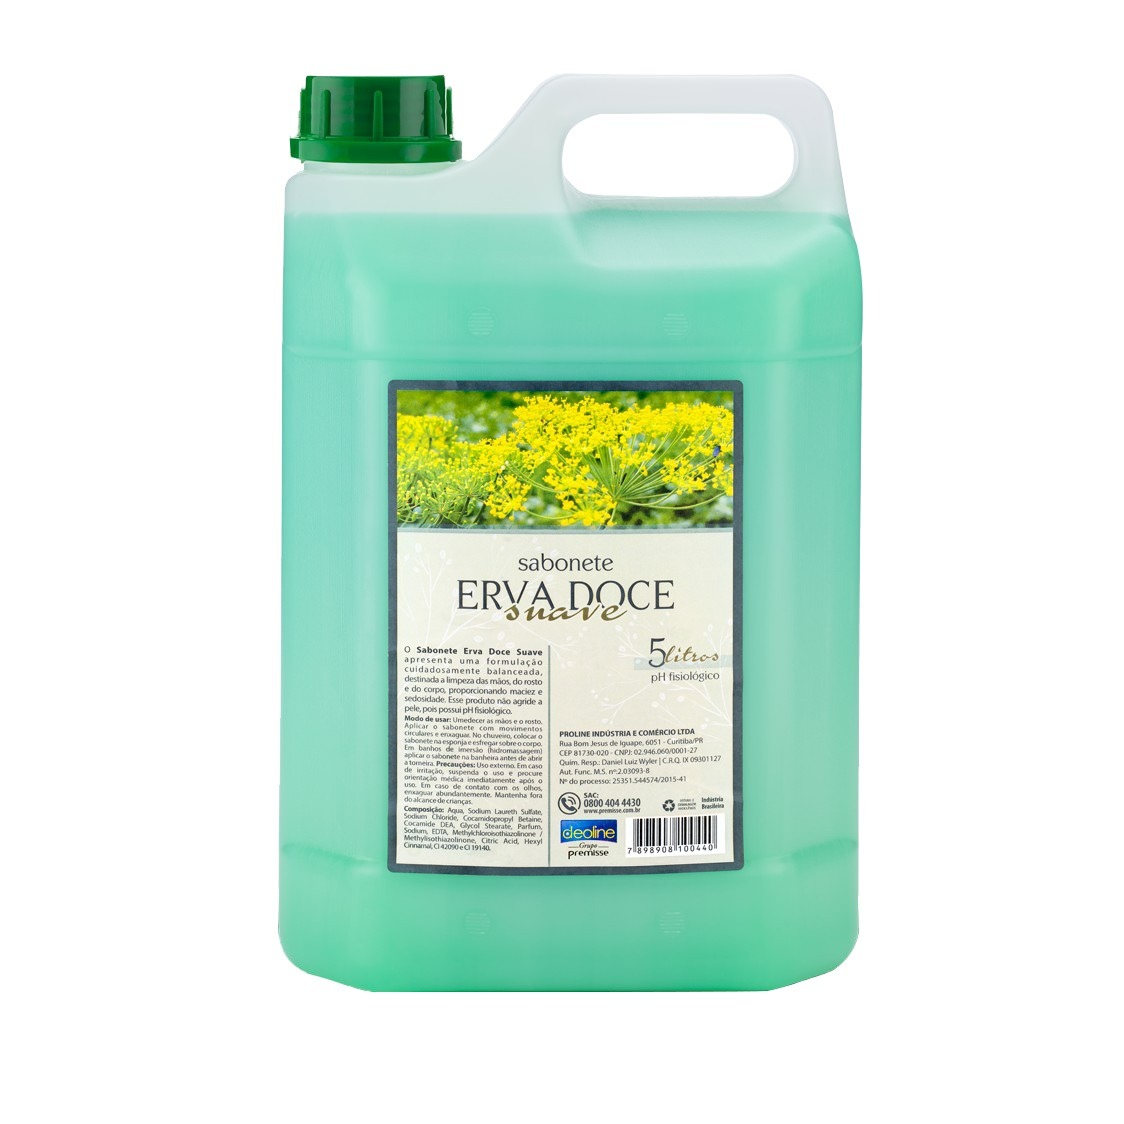 Sabonete Liquido Erva Doce Deoline 5L - Premisse